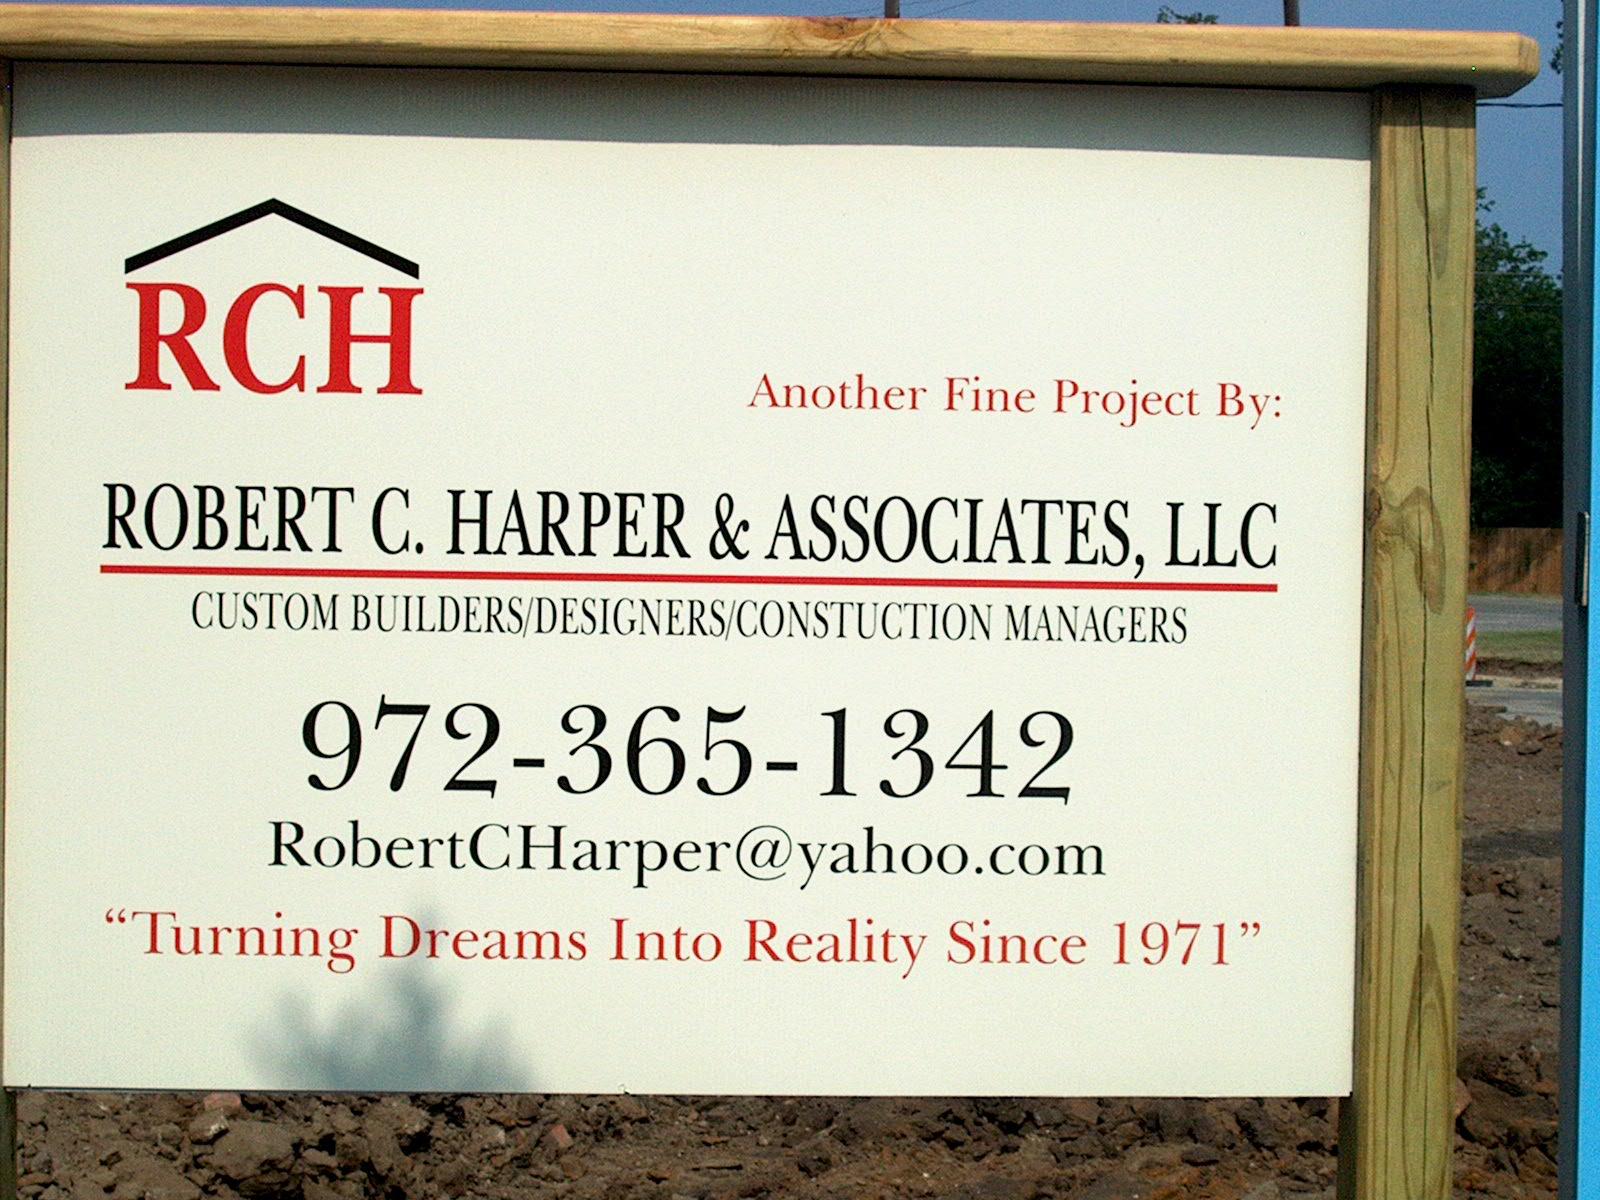 ROBERT C. HARPER & ASSOCIATES CUSTOM BUILDING & REMODELING